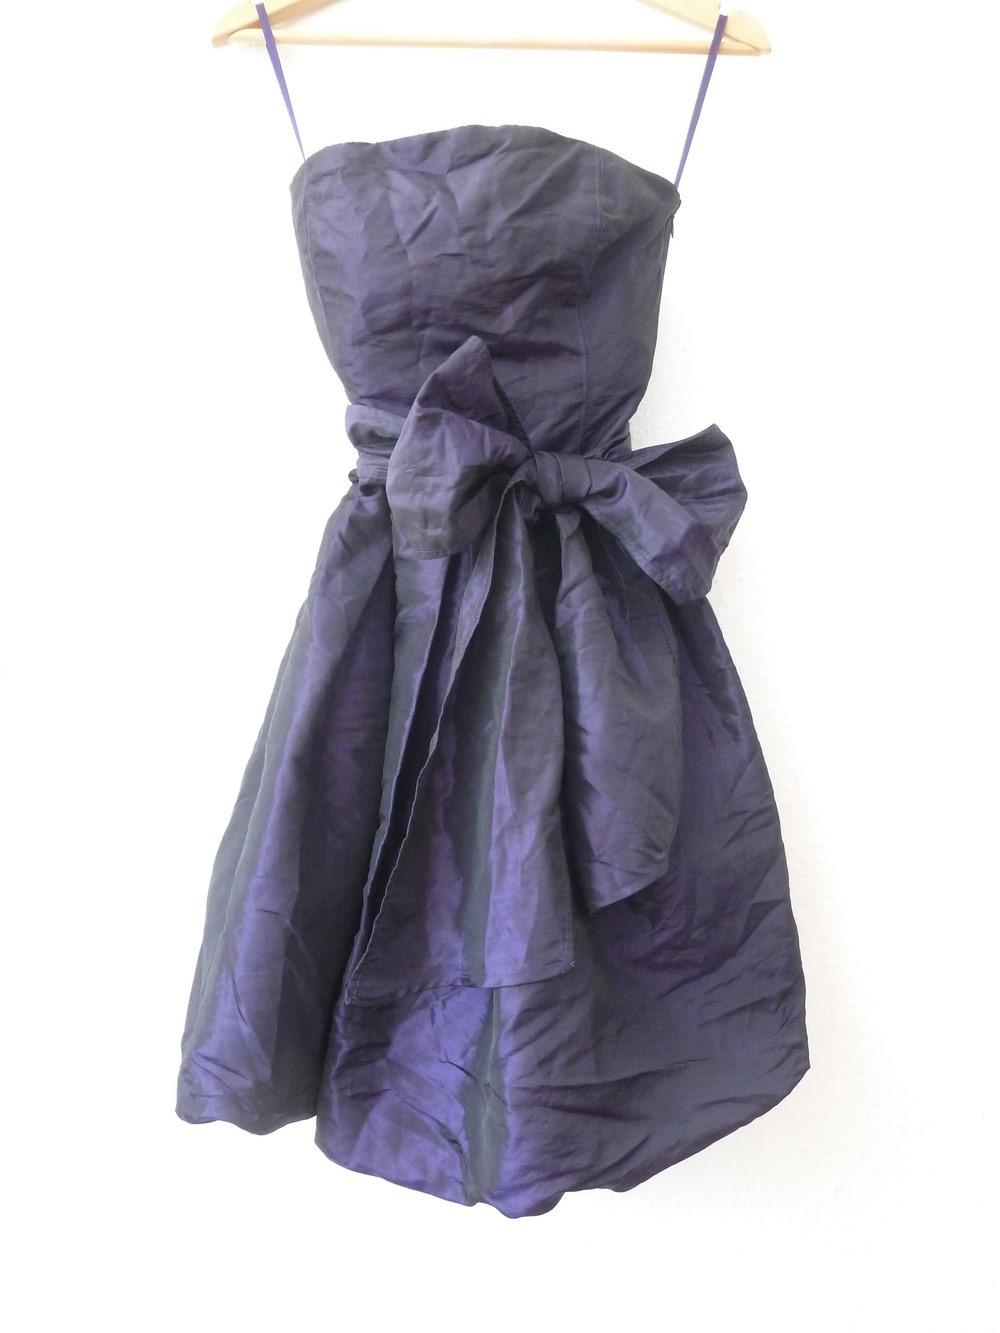 bandeau kleid abiball abschluss jugendweihe festlich lila glänzend p&c 36